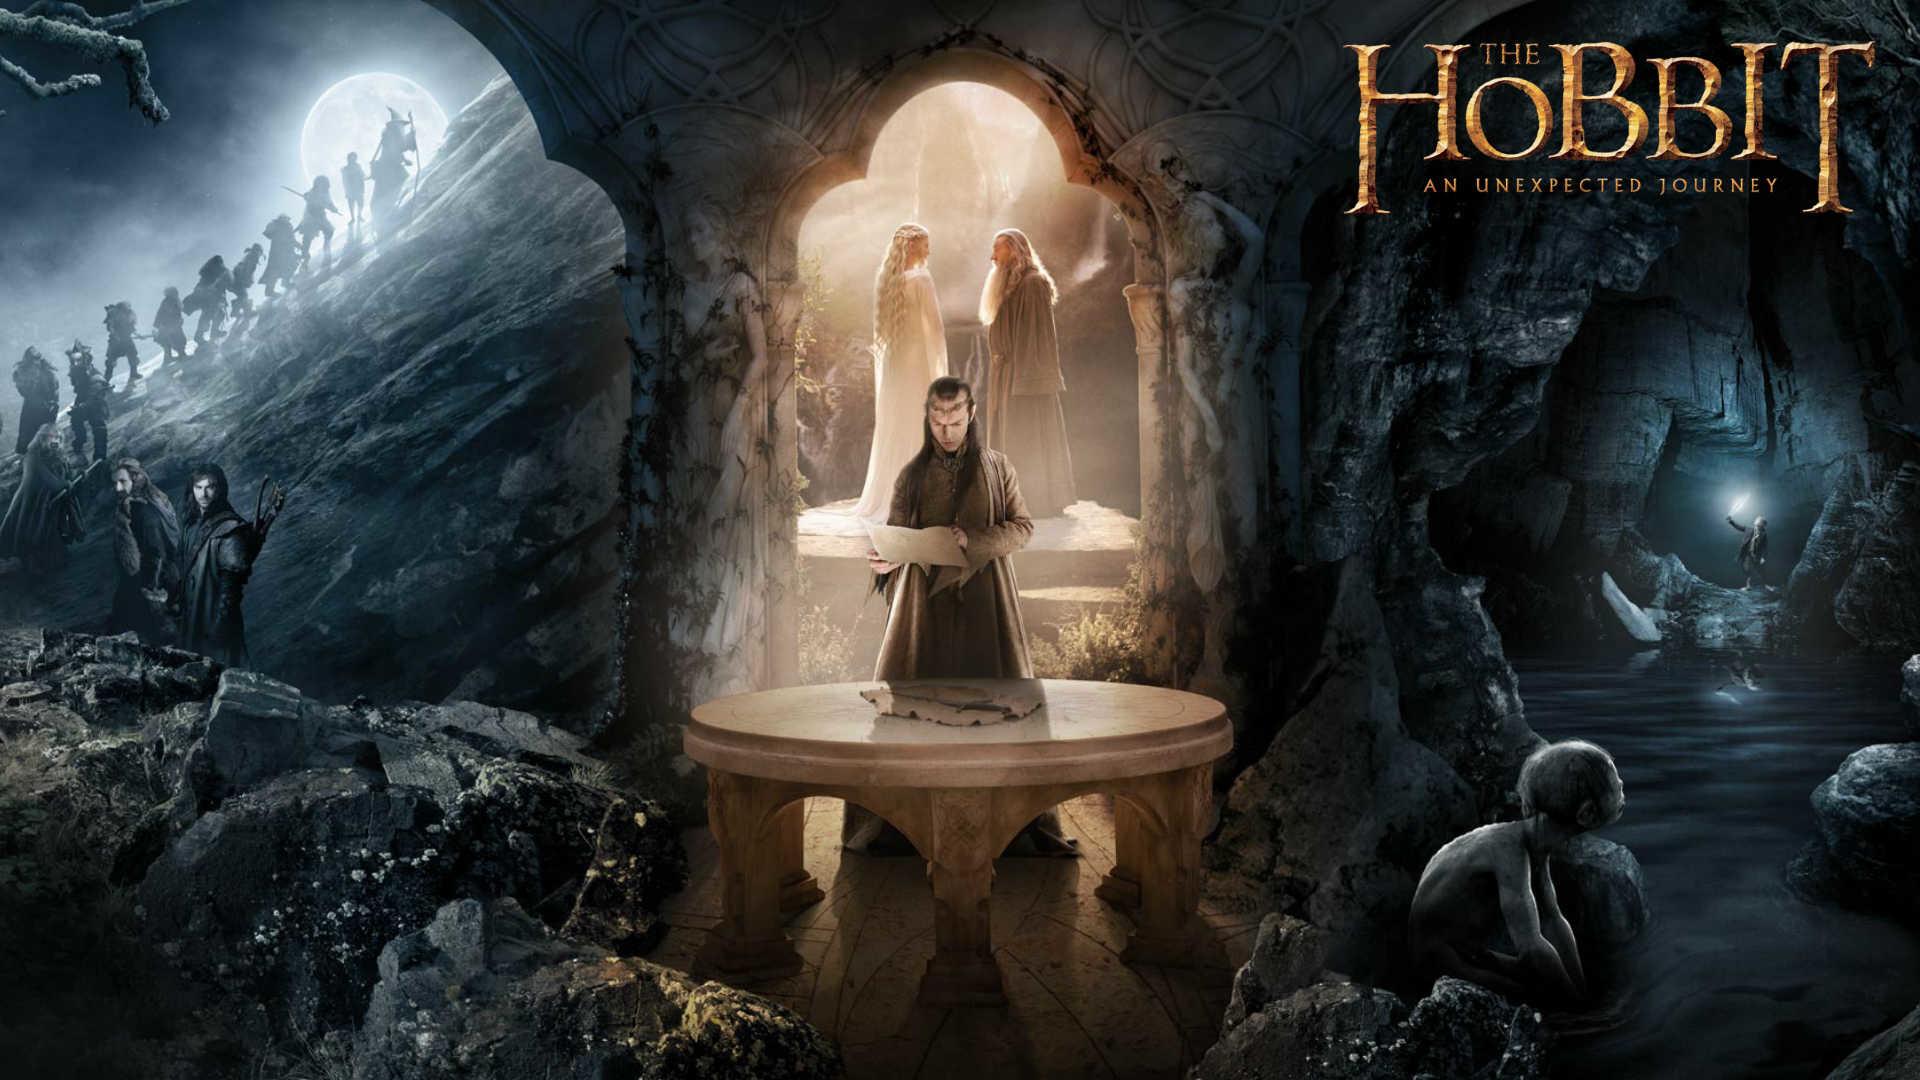 87 The Hobbit: An Unexpected Journey Wallpapers | The Hobbit: An ..